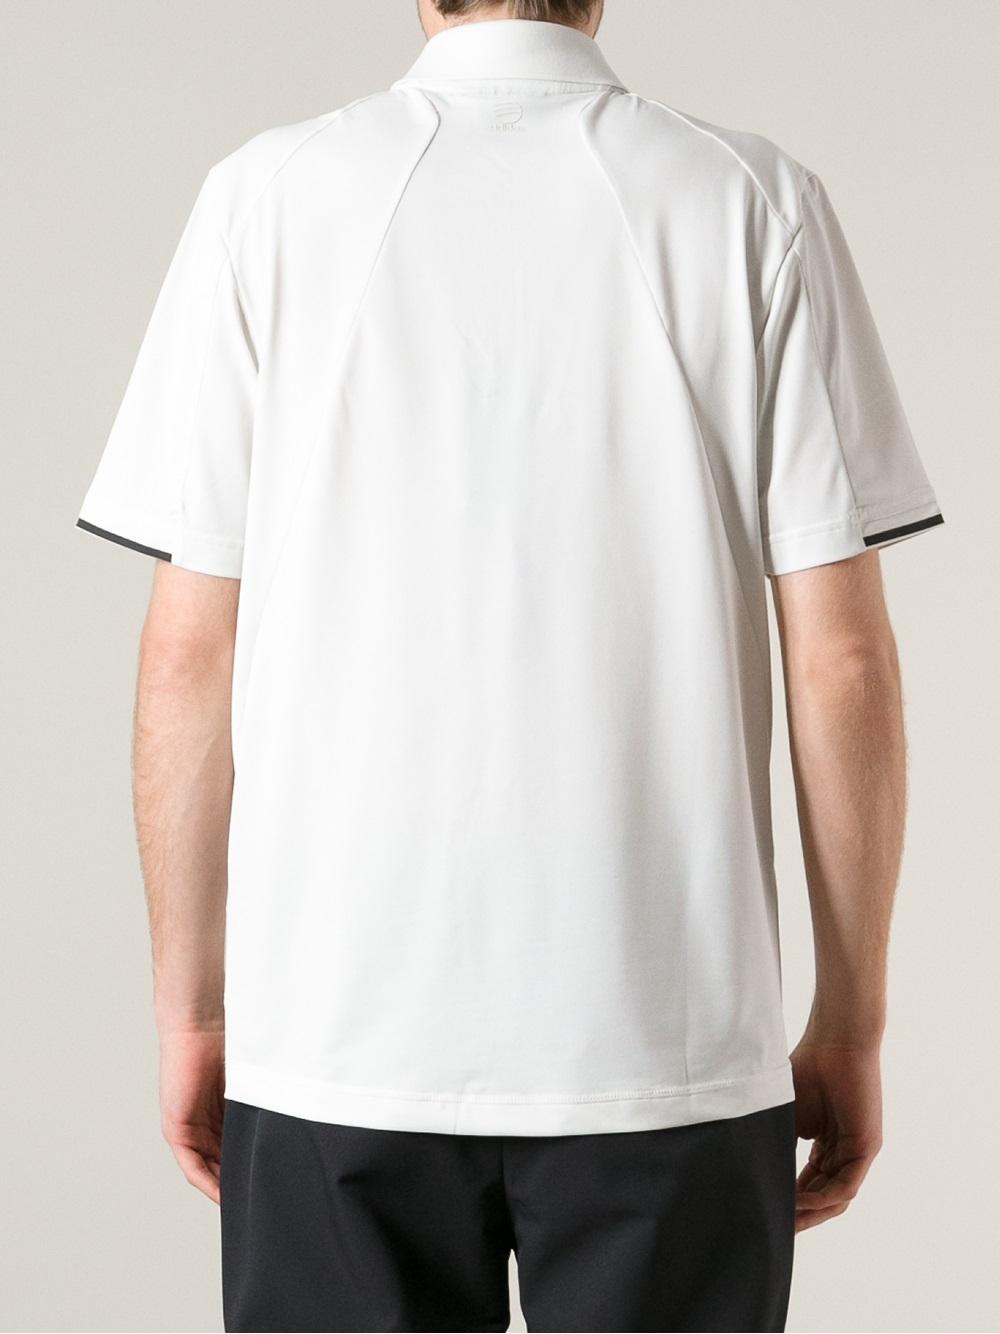 lyst porsche design branded jersey polo shirt in white. Black Bedroom Furniture Sets. Home Design Ideas